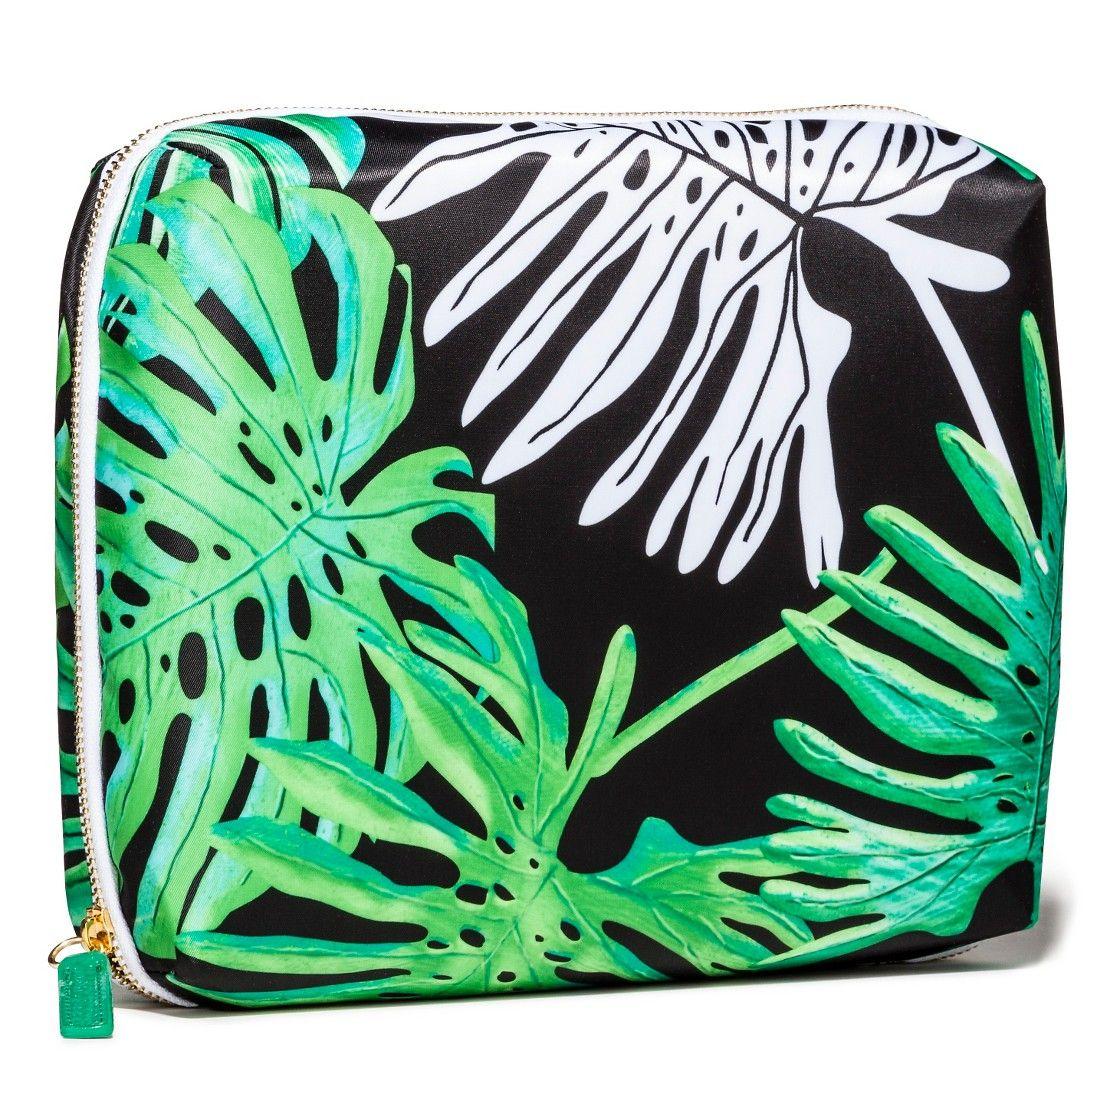 6c12911cc1a3 Sonia Kashuk Palm Print Beauty Organizer $24.99   Things   Makeup ...